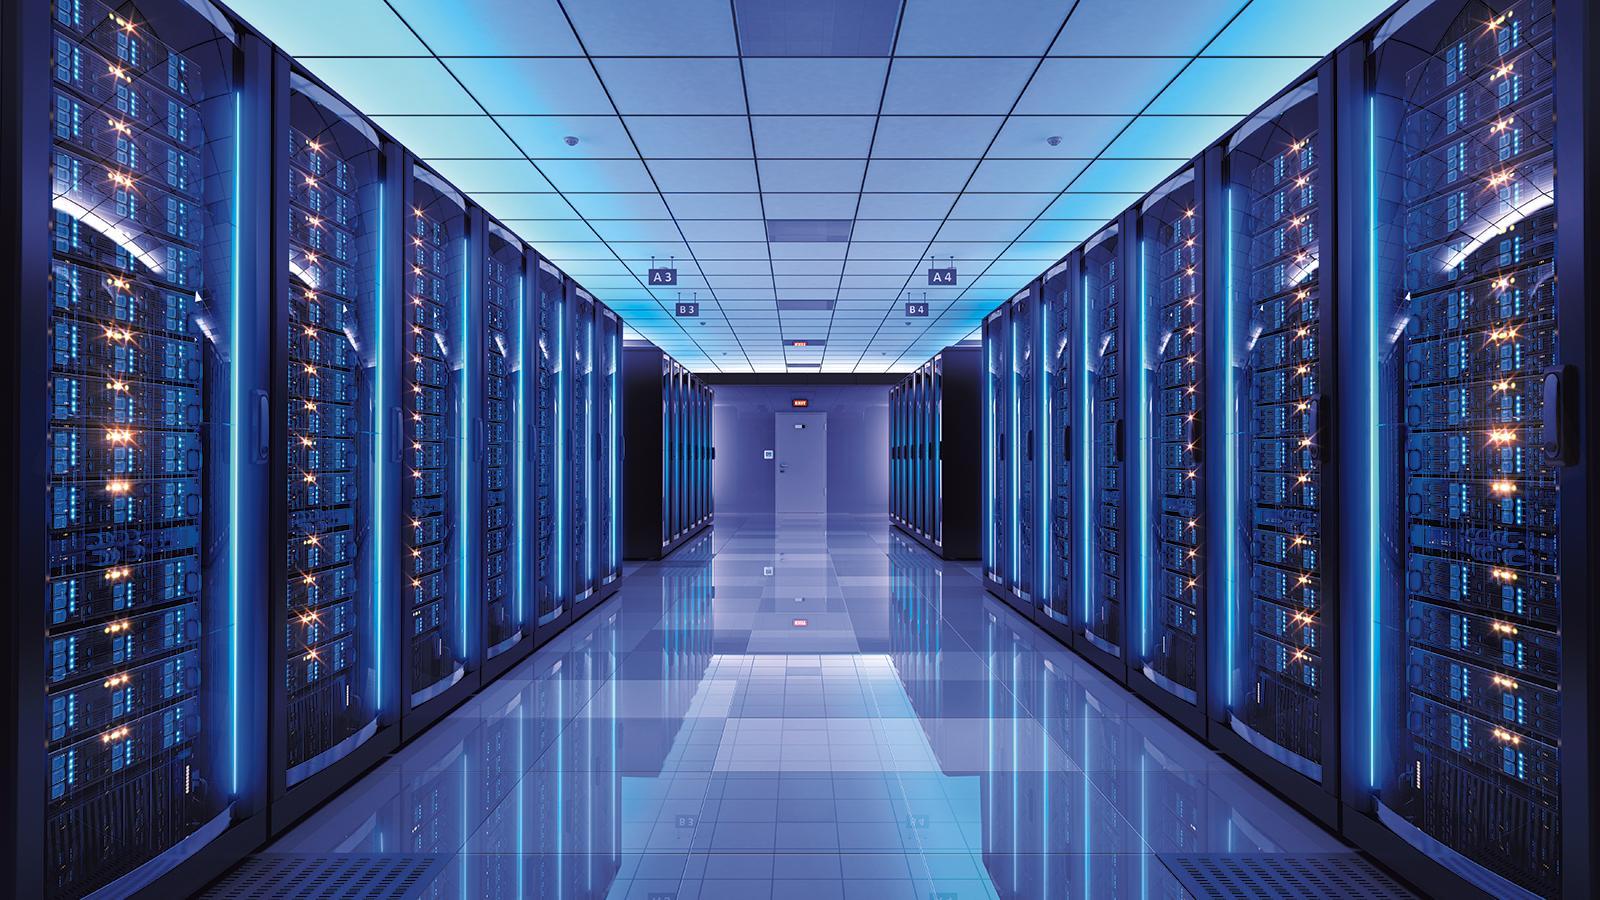 monitor datacenter rack server in room interior stock terminal photo with racks